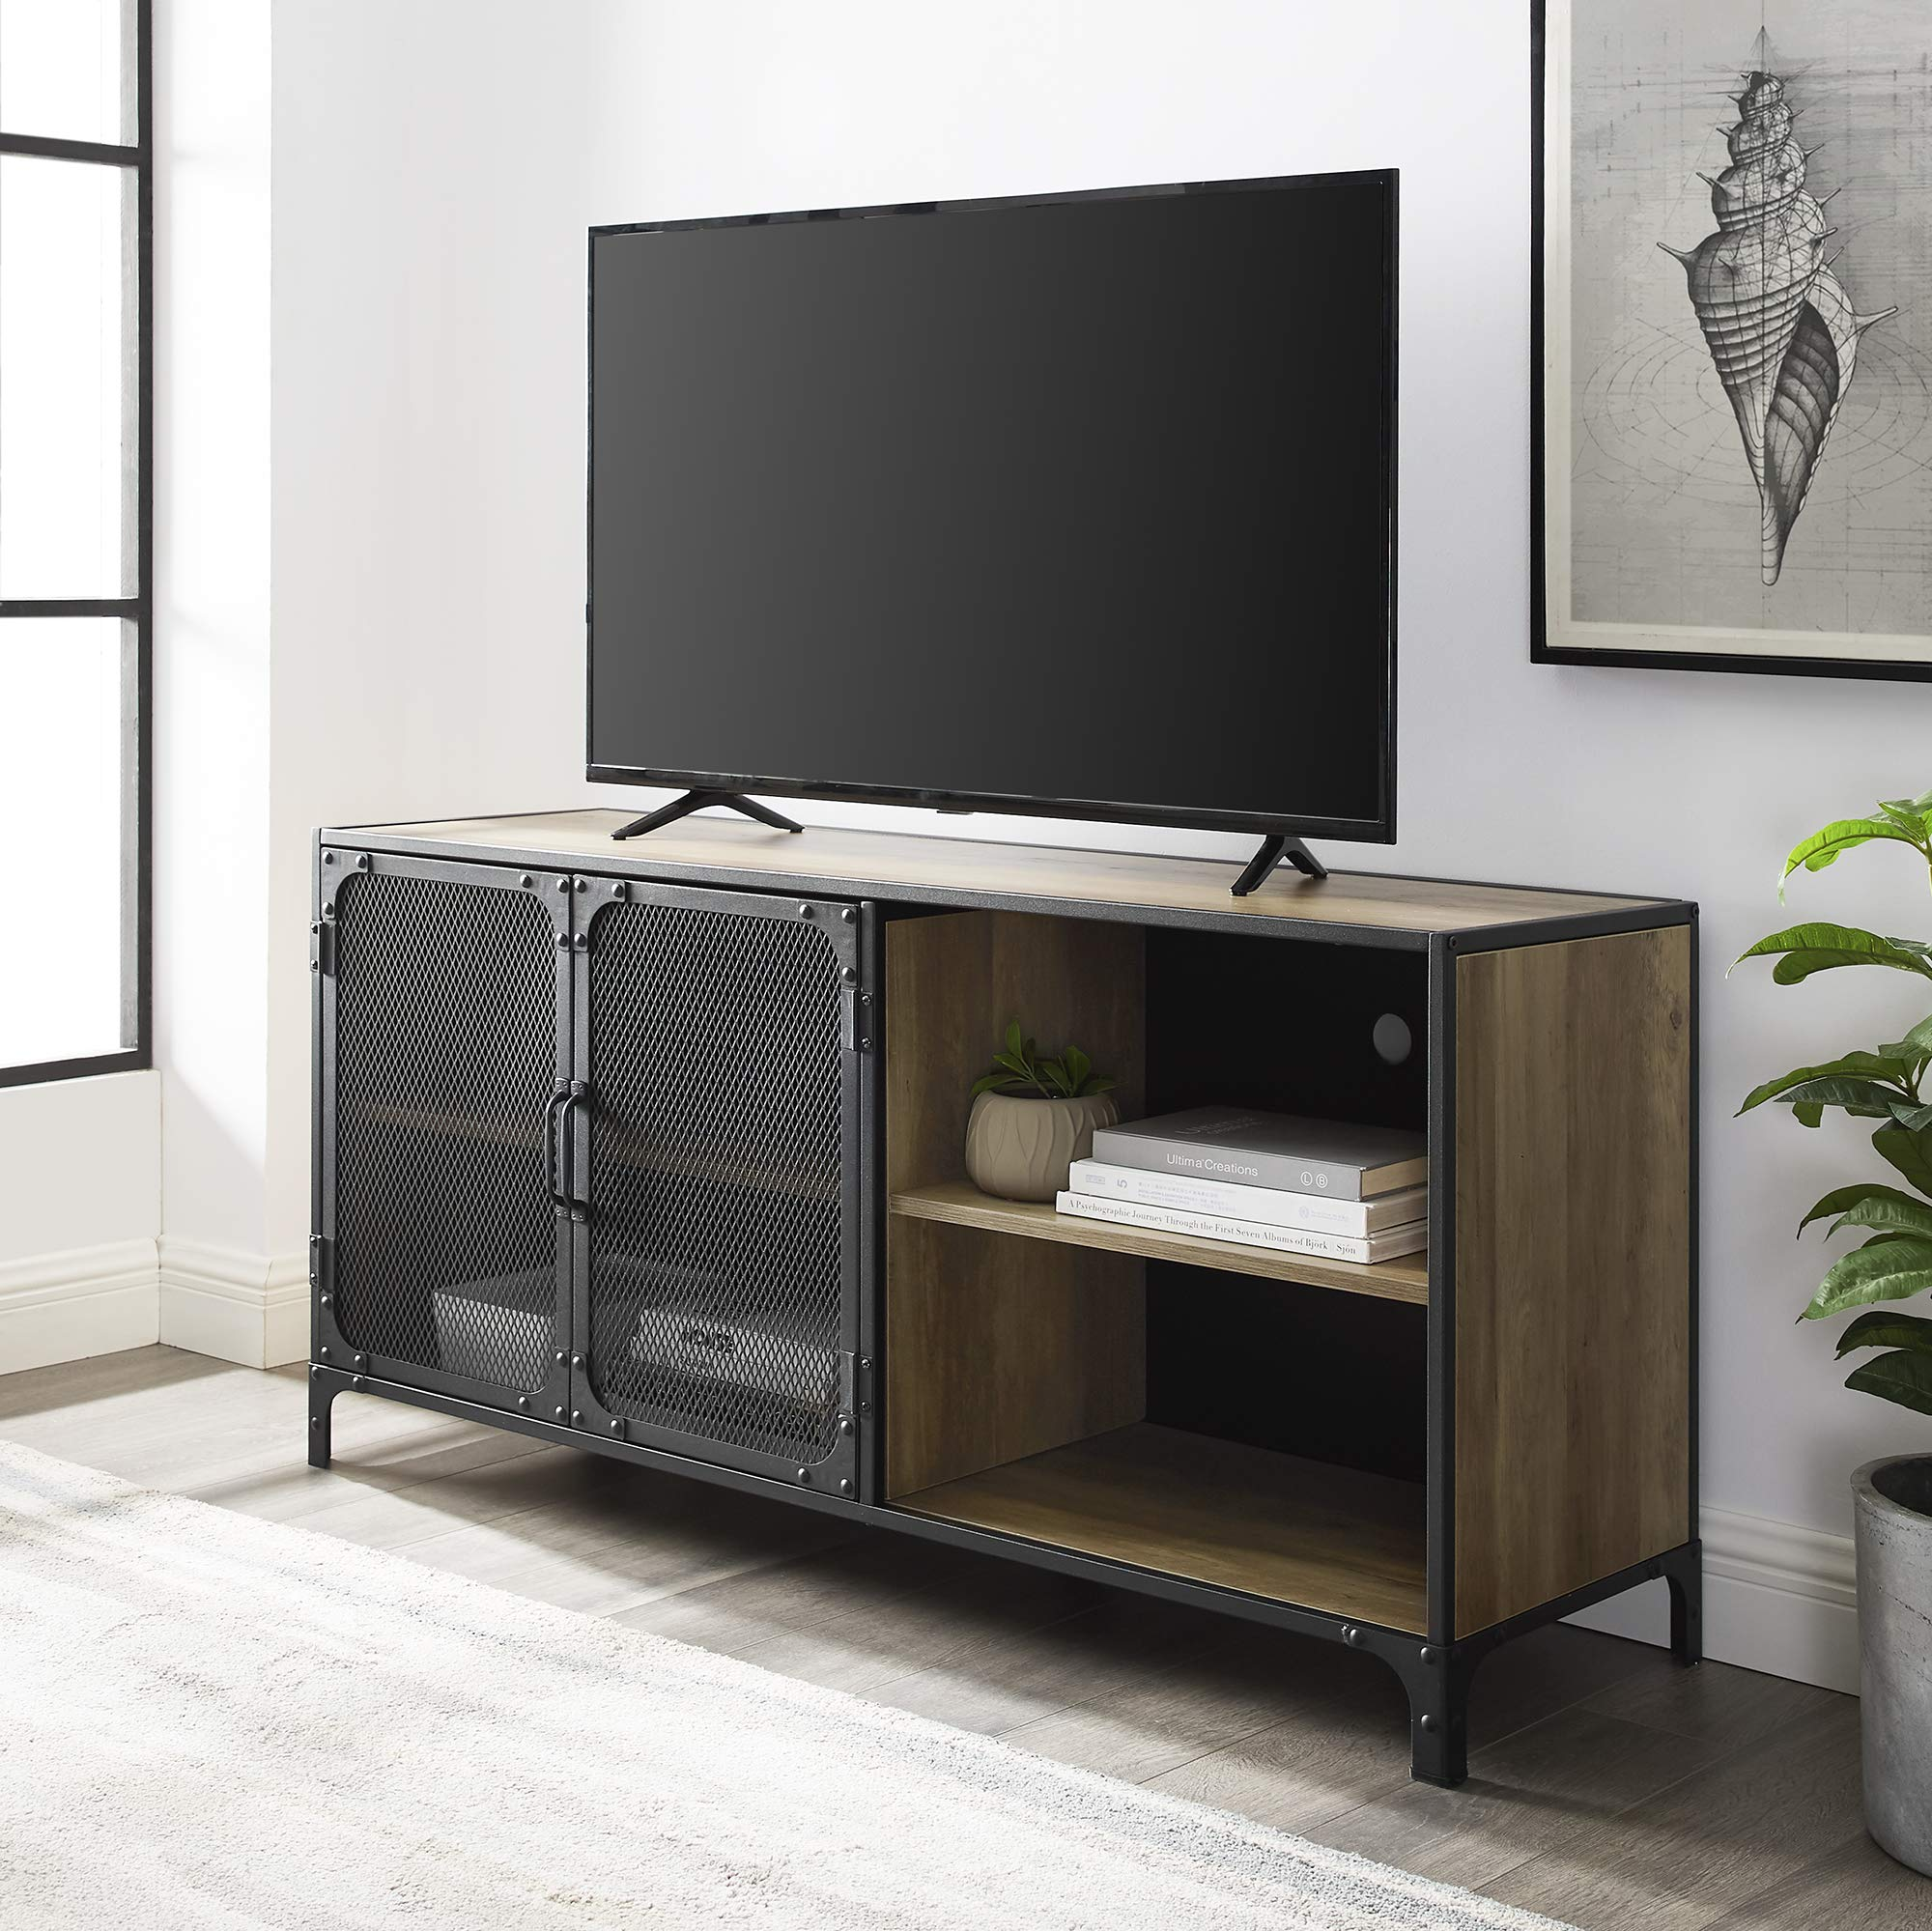 Walker Edison Maison Industrial Metal Mesh Door for TVs up to 58 Inches, 52 Inch, Reclaimed Barnwood